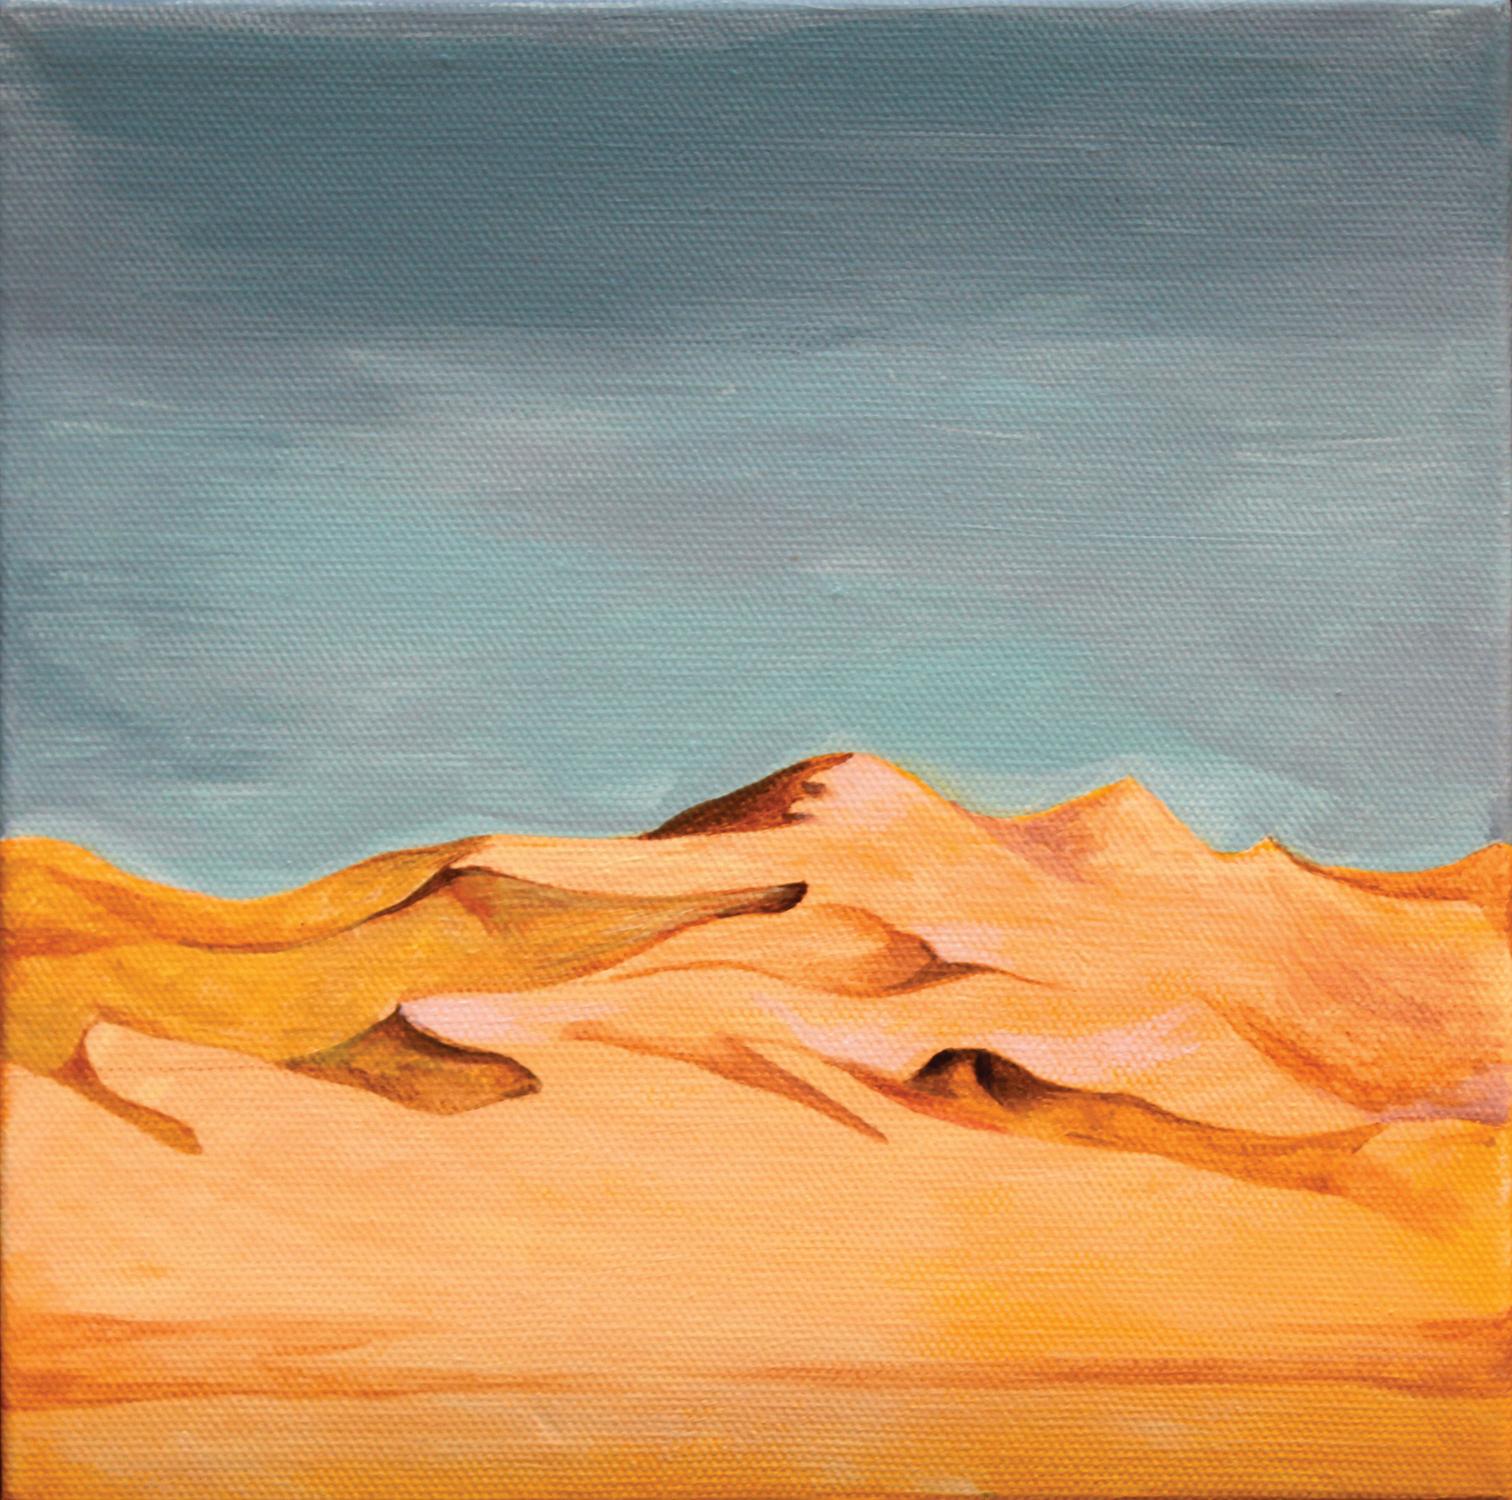 A desert in San diego  27x27cm Acrylic on Canvas_2014